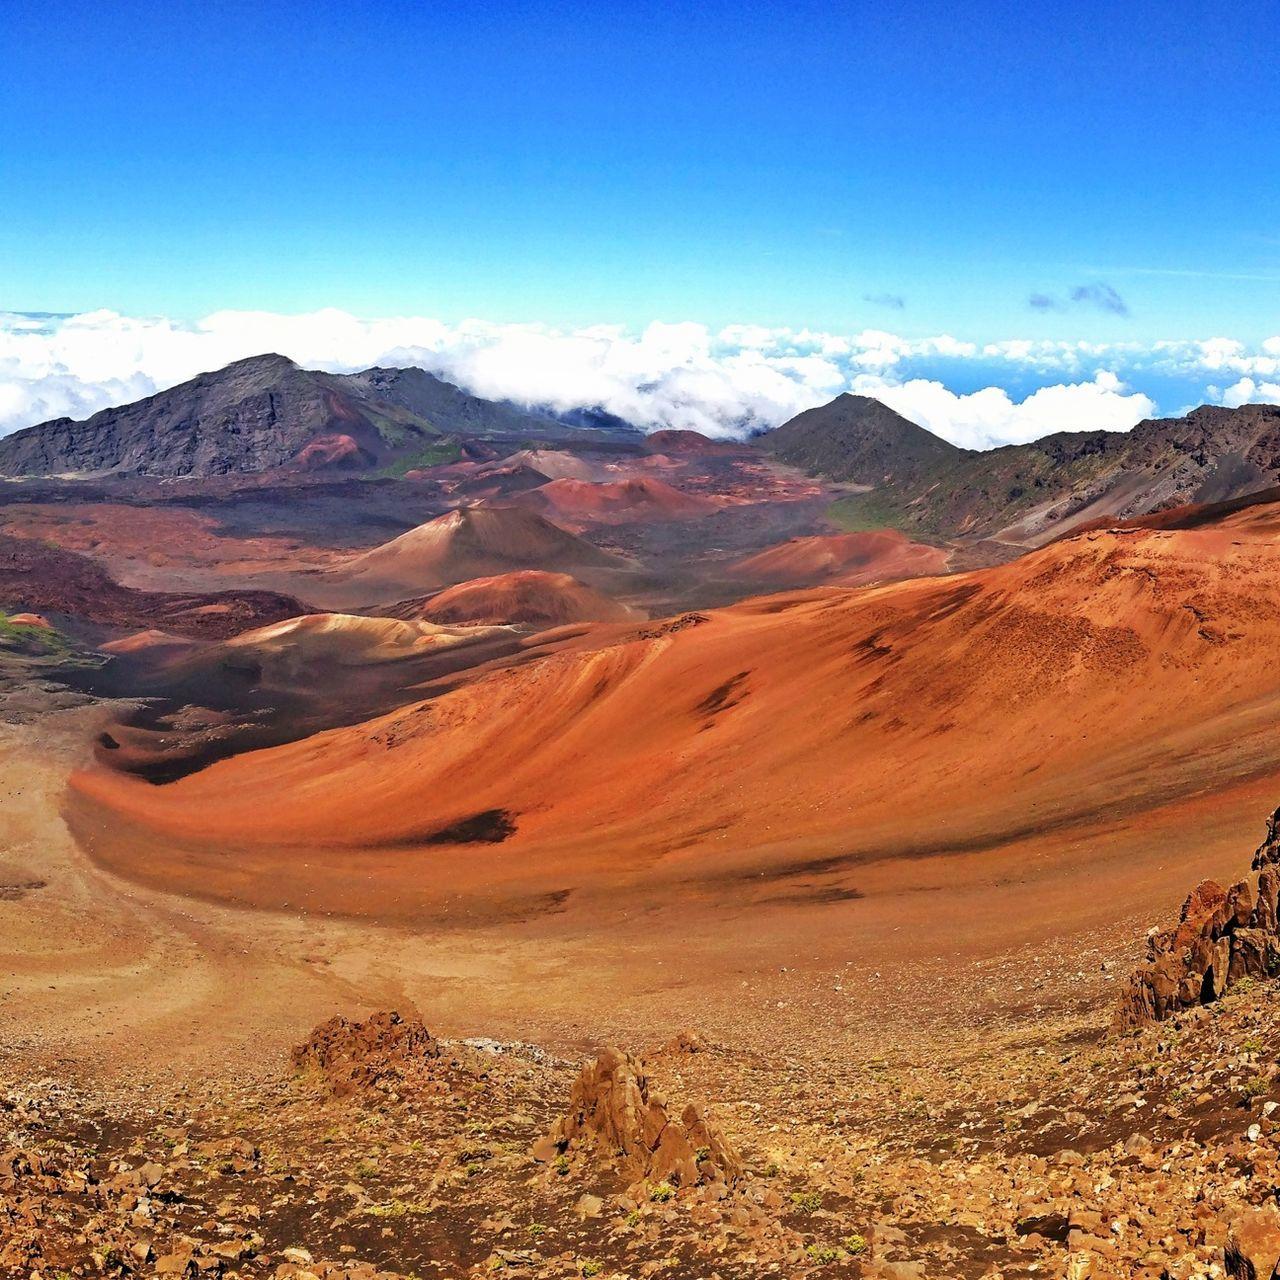 Barren landscape against mountain range and blue sky